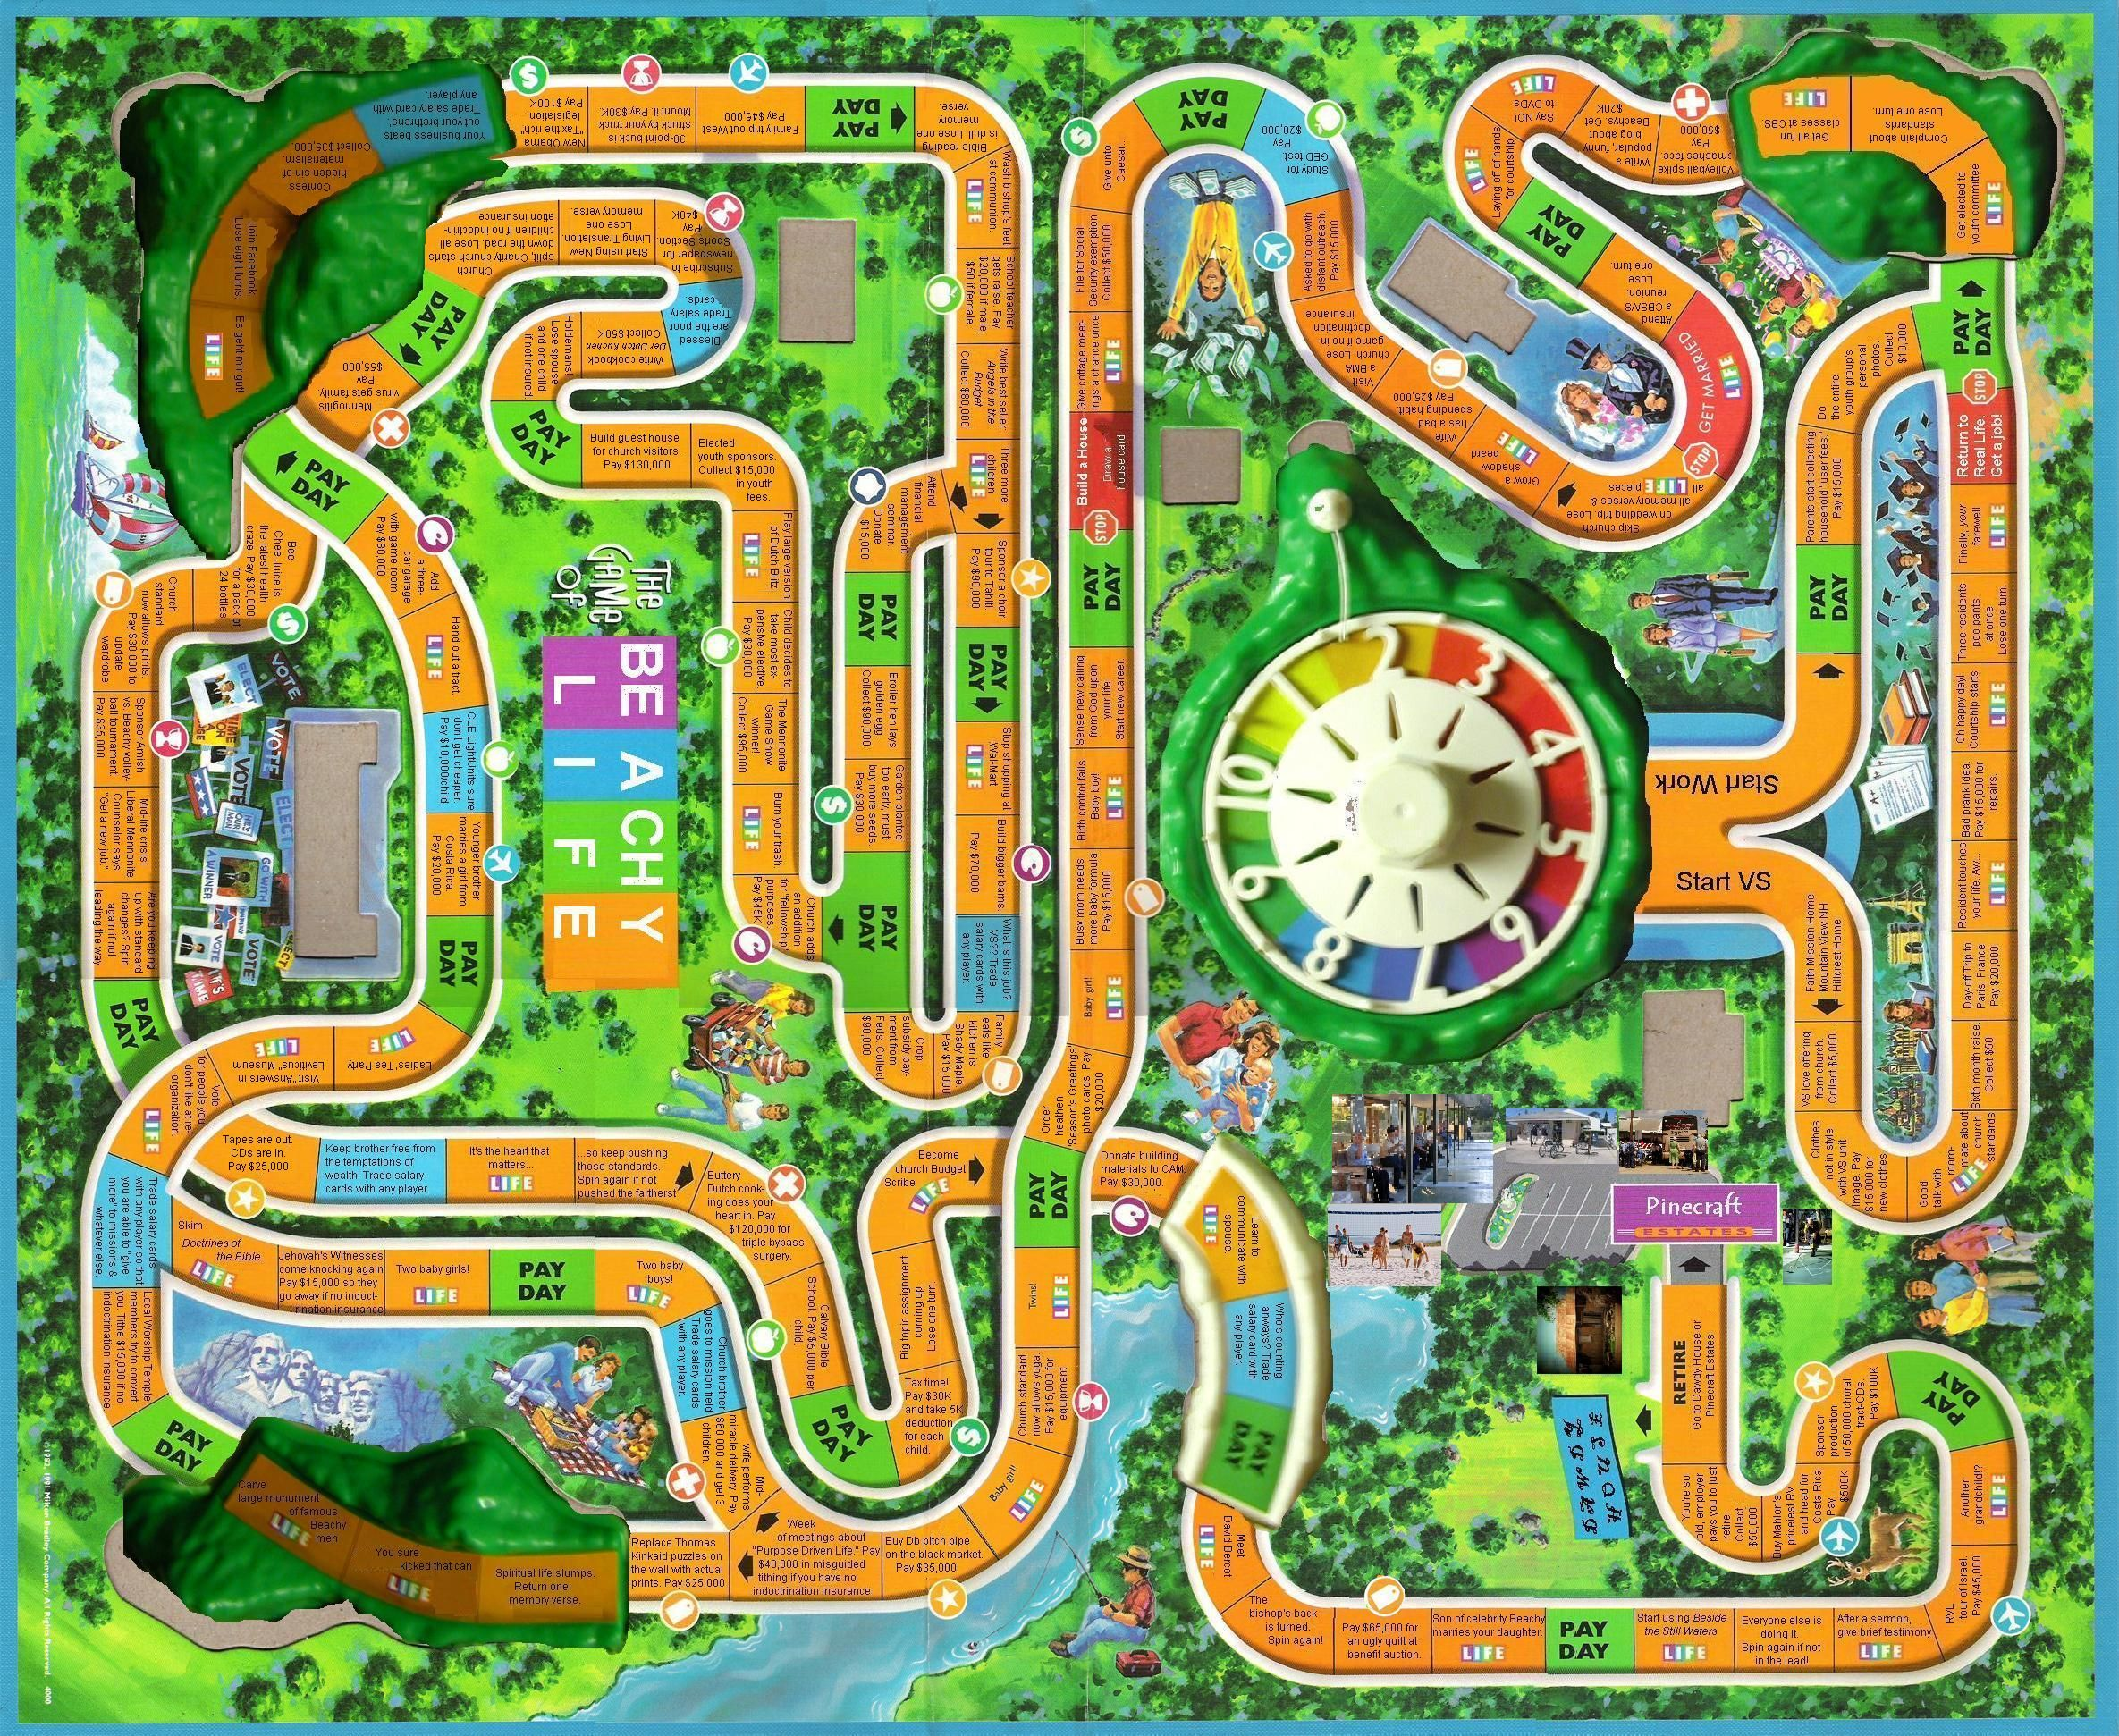 Race track printable board games - See 12 Best Images Of Printable Board Game Of Life Inspiring Printable Board Game Of Life Printable Images Free Printable Game Boards Life Board Game